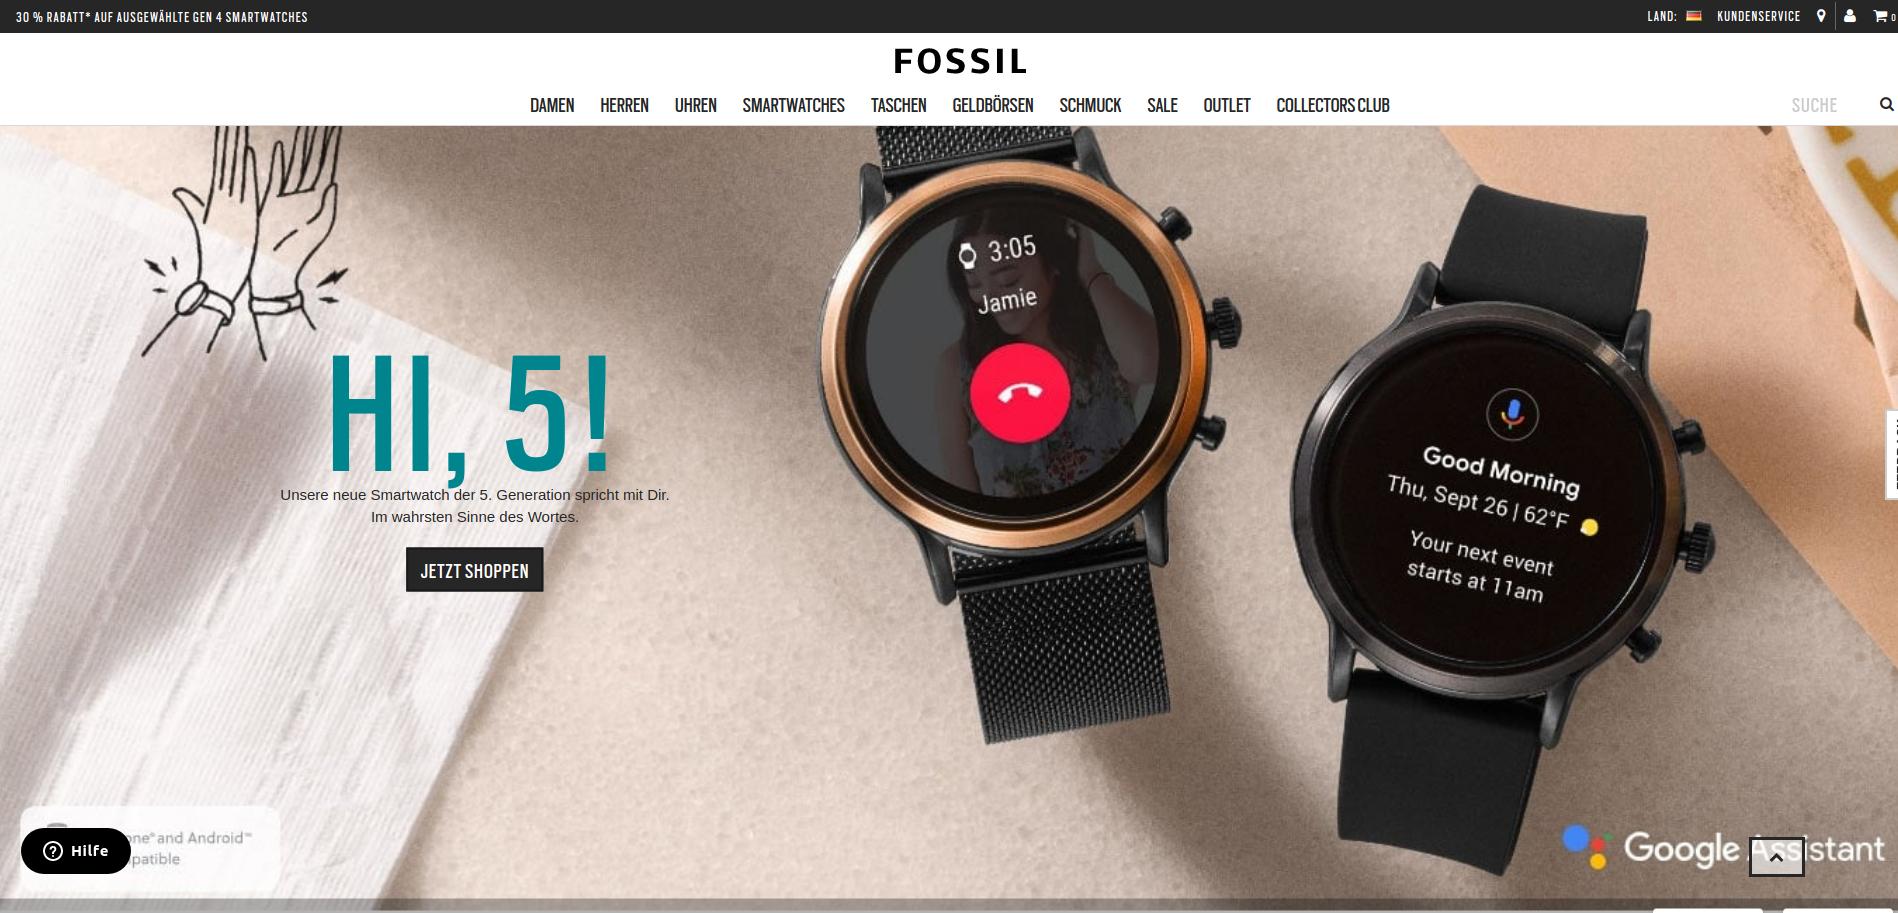 Fossil Smartwatch Carlyle/Julianna (5. Generation)